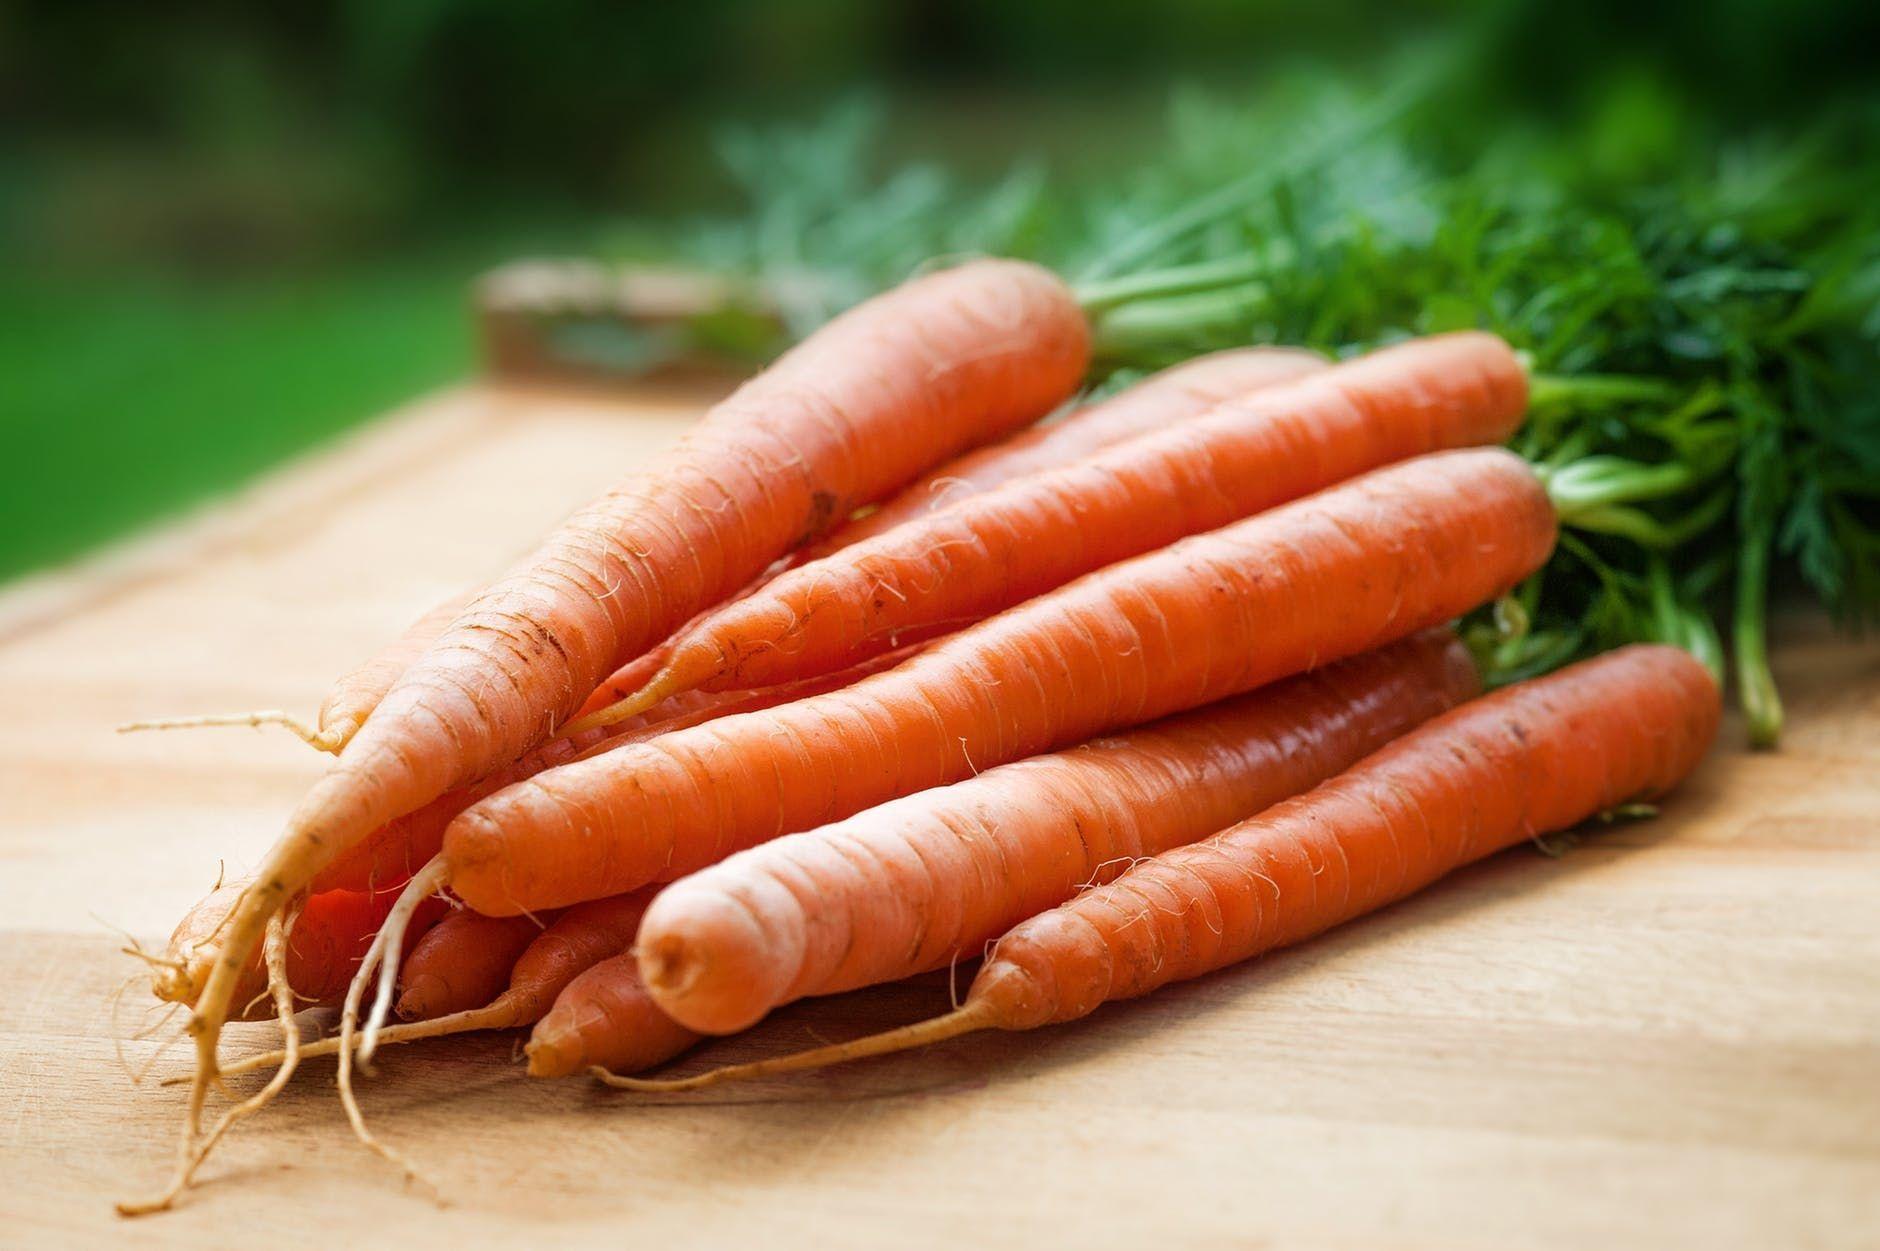 7 Makanan yang Bisa Bikin Kulit Wajah Makin Cerah